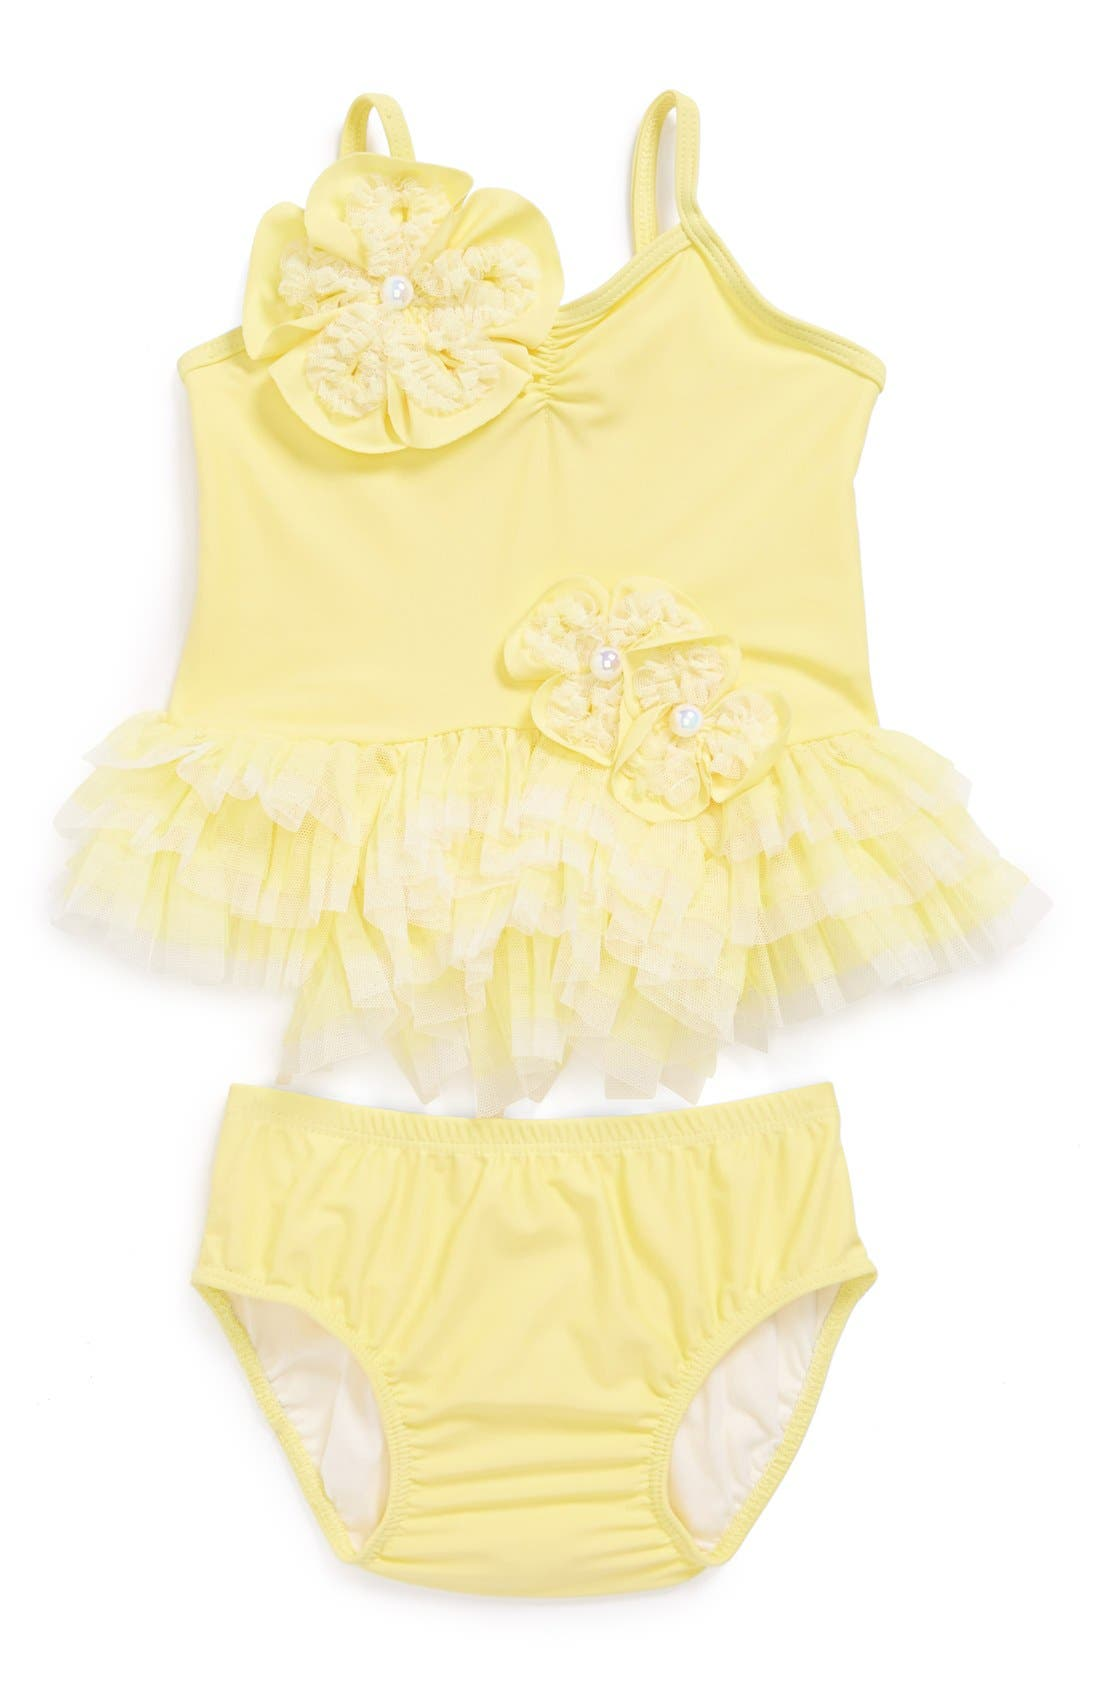 Alternate Image 1 Selected - Isobella & Chloe 'Lemon Drop' Two-Piece Swimsuit (Baby Girls)